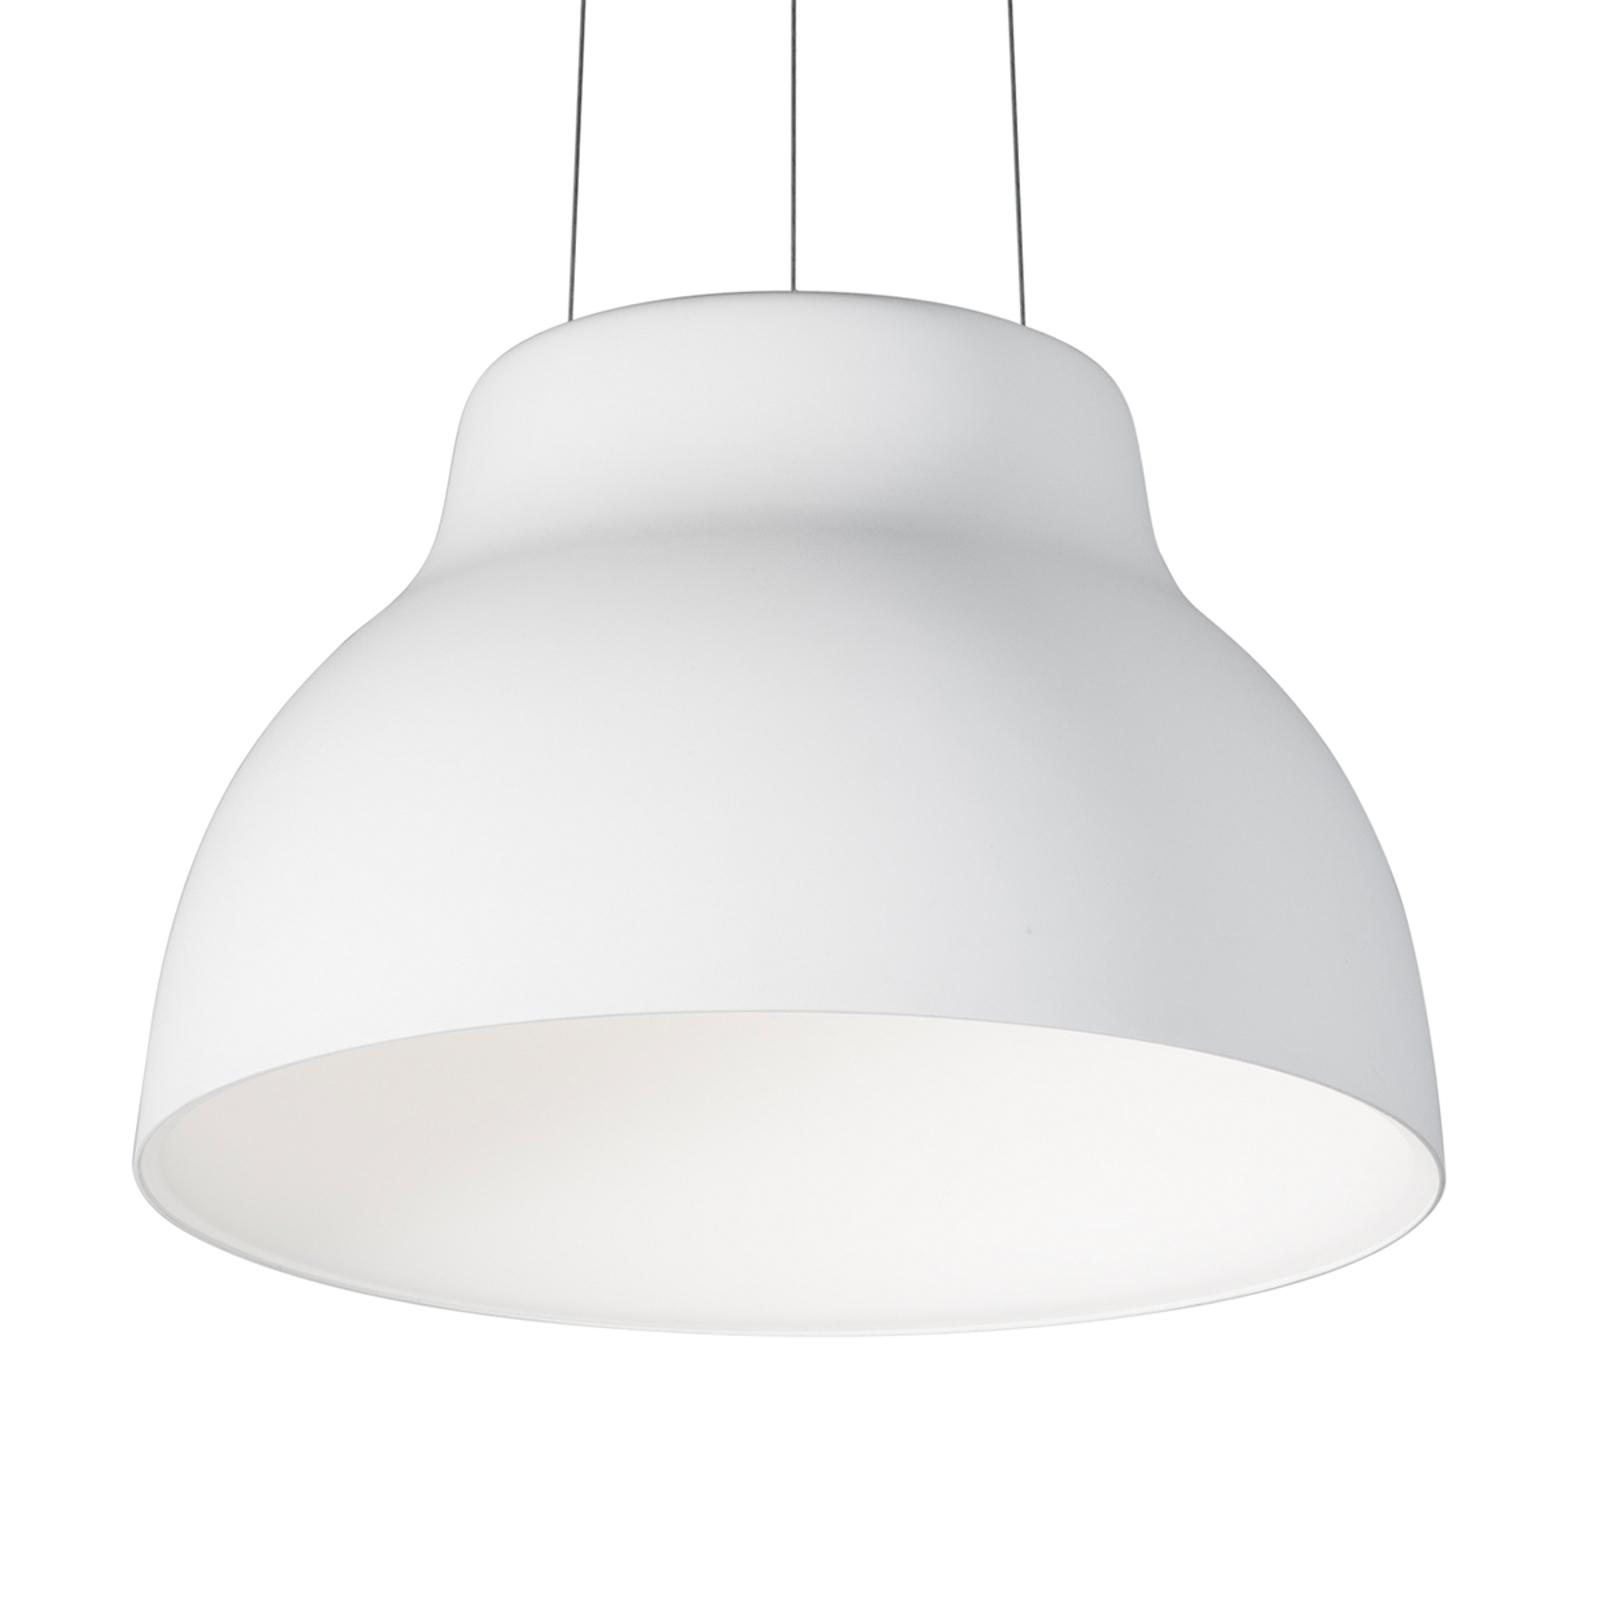 Martinelli Luce Cicala - LED-pendellampa, vit